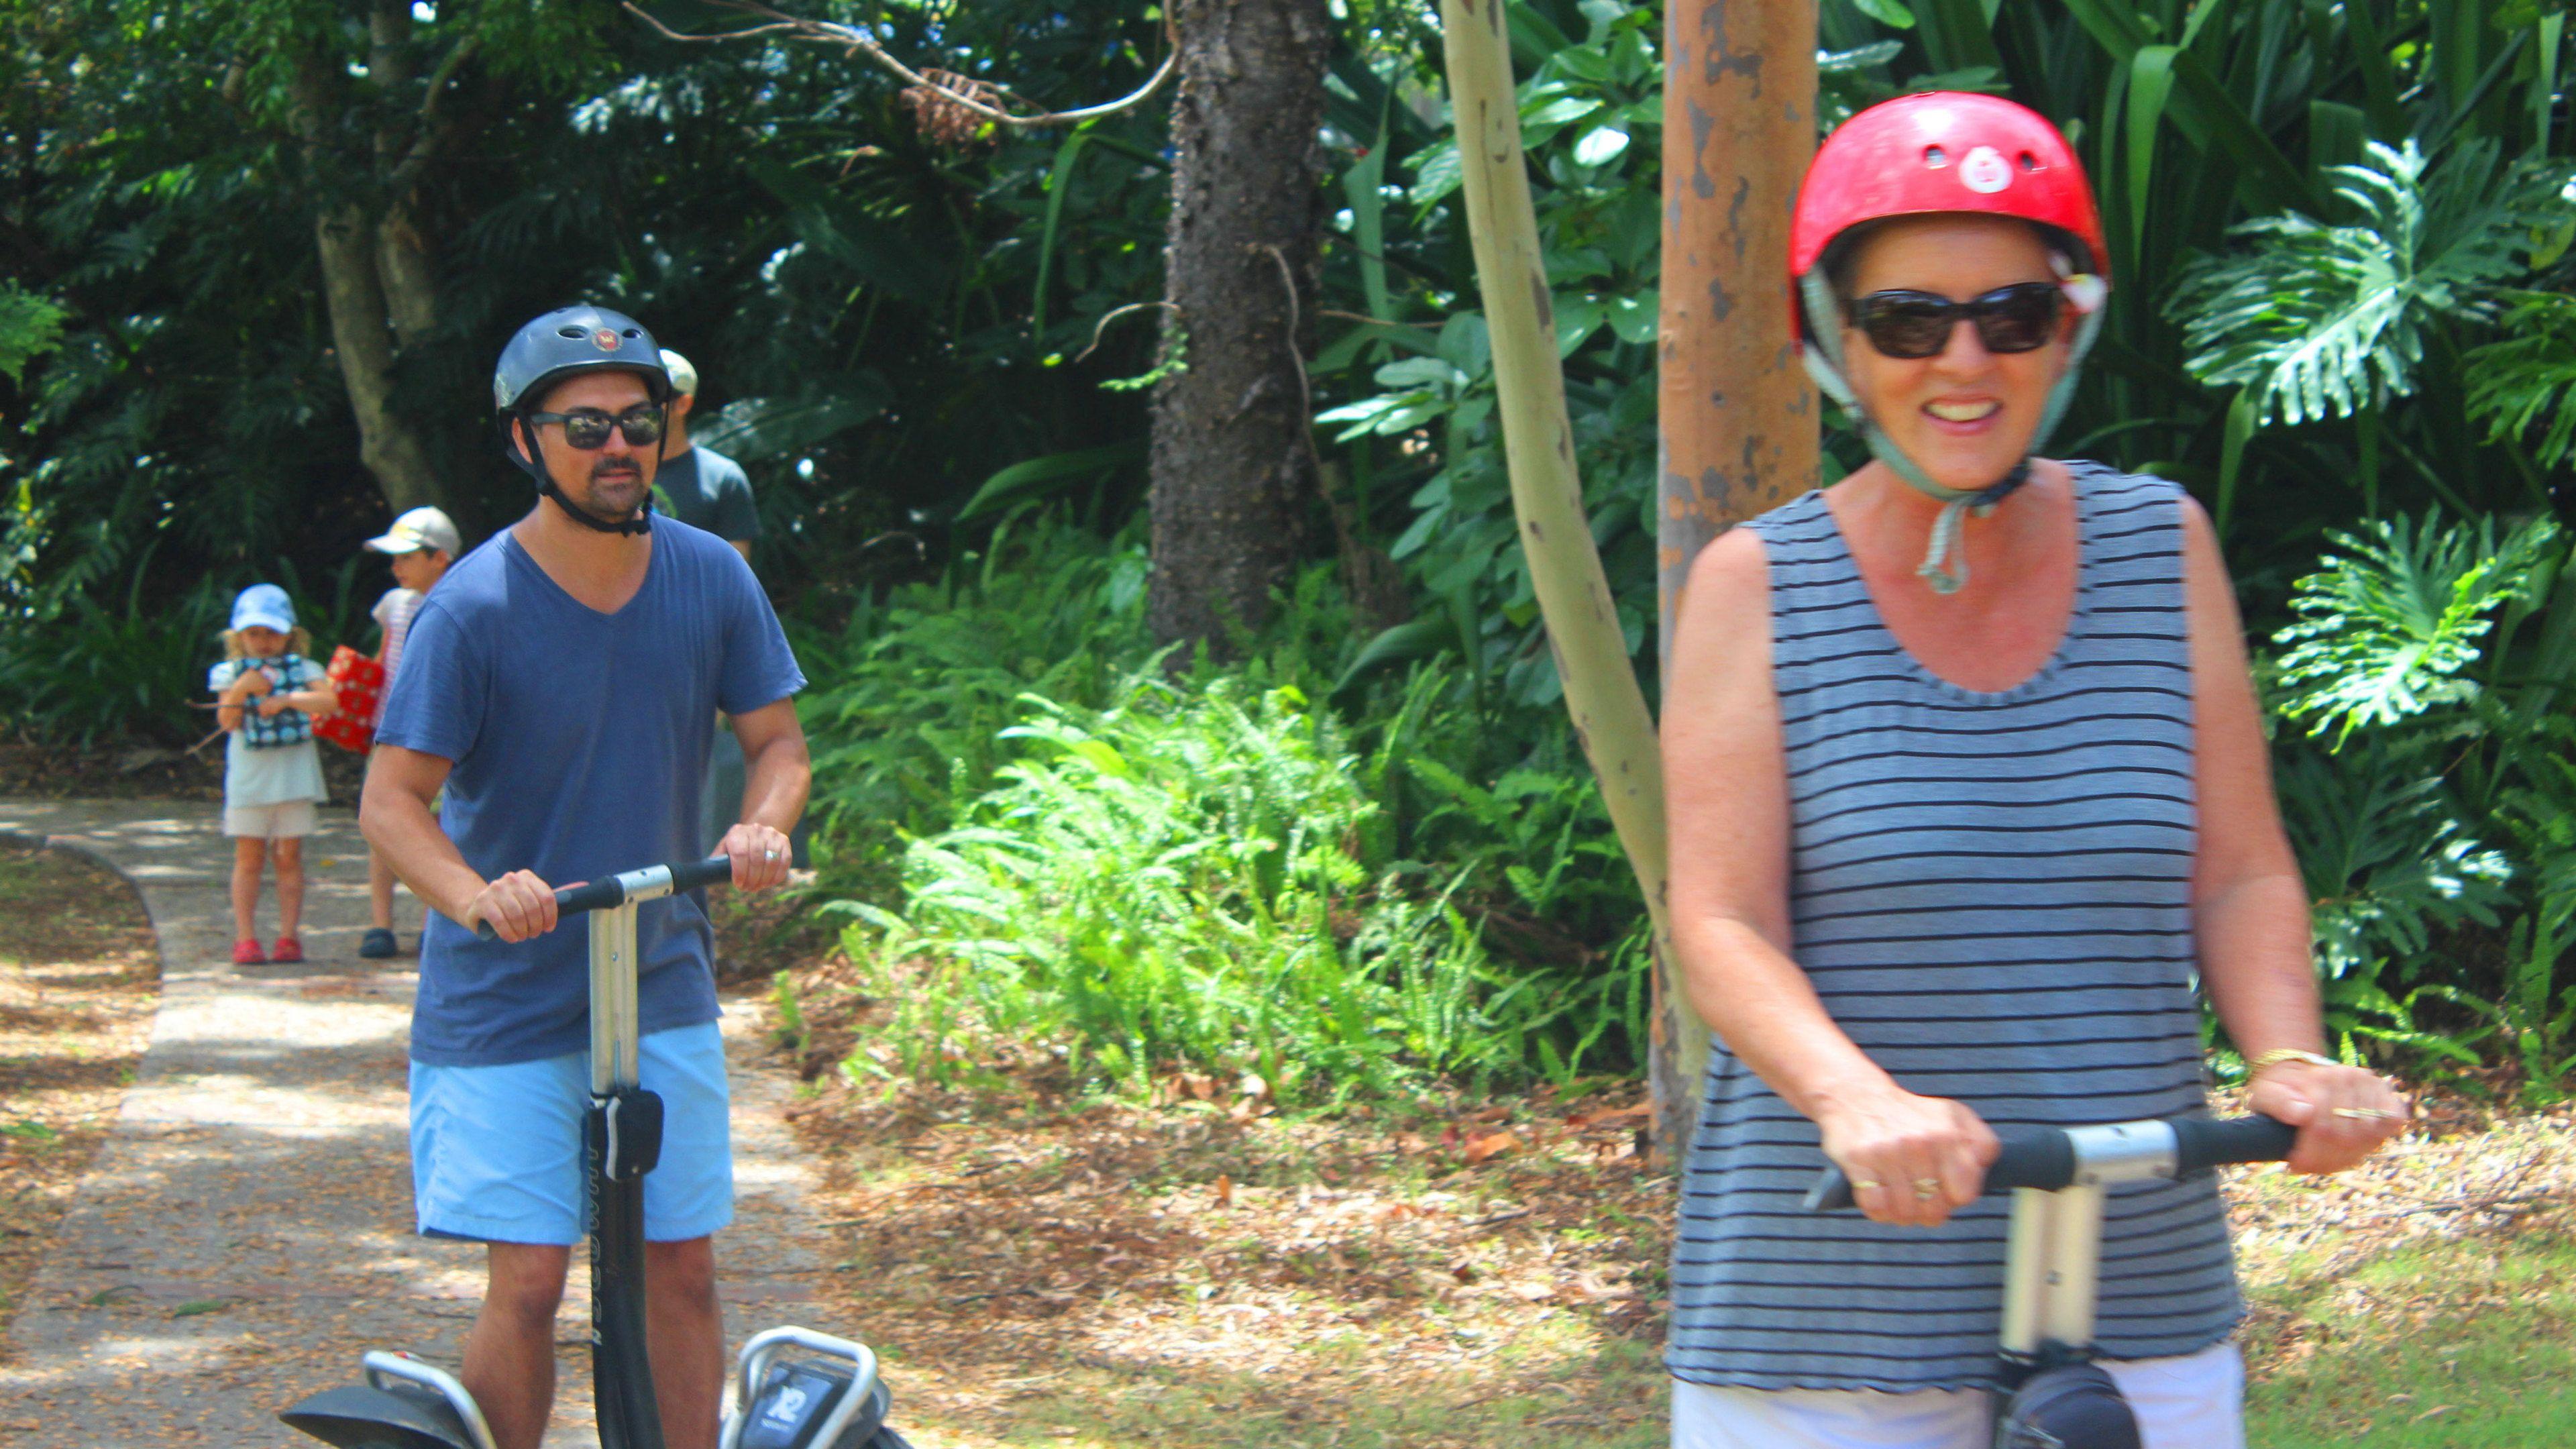 Segway tour or Queensland